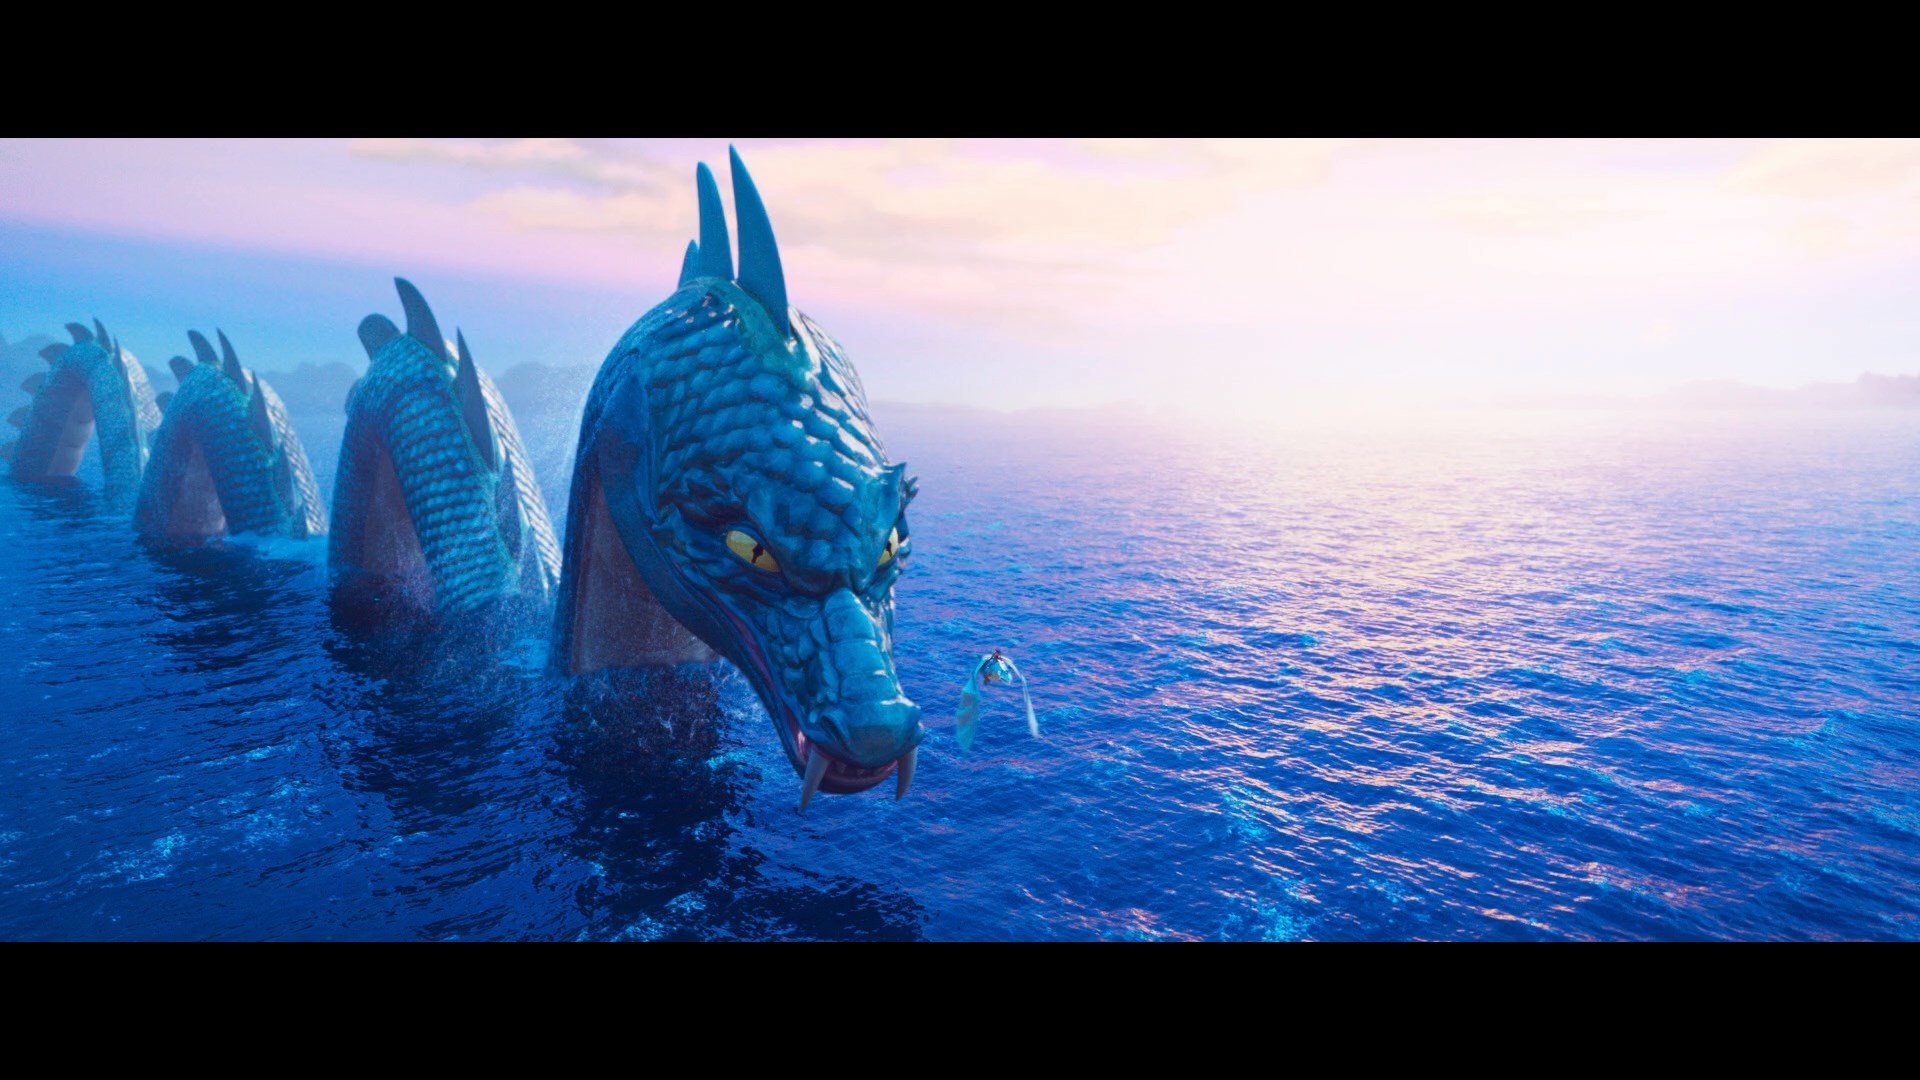 El jinete del dragón (2020) 1080p Remux Latino